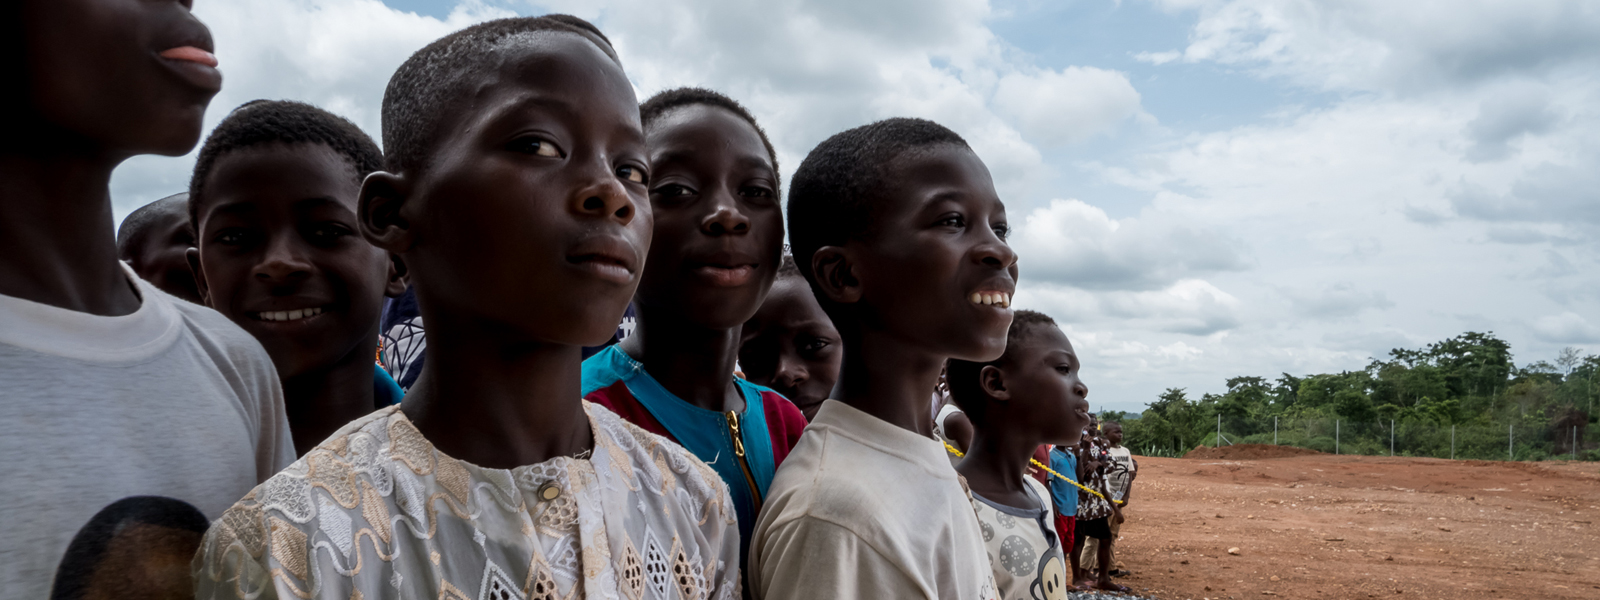 REPORTERA ESPÍDICA EN GHANA (I)